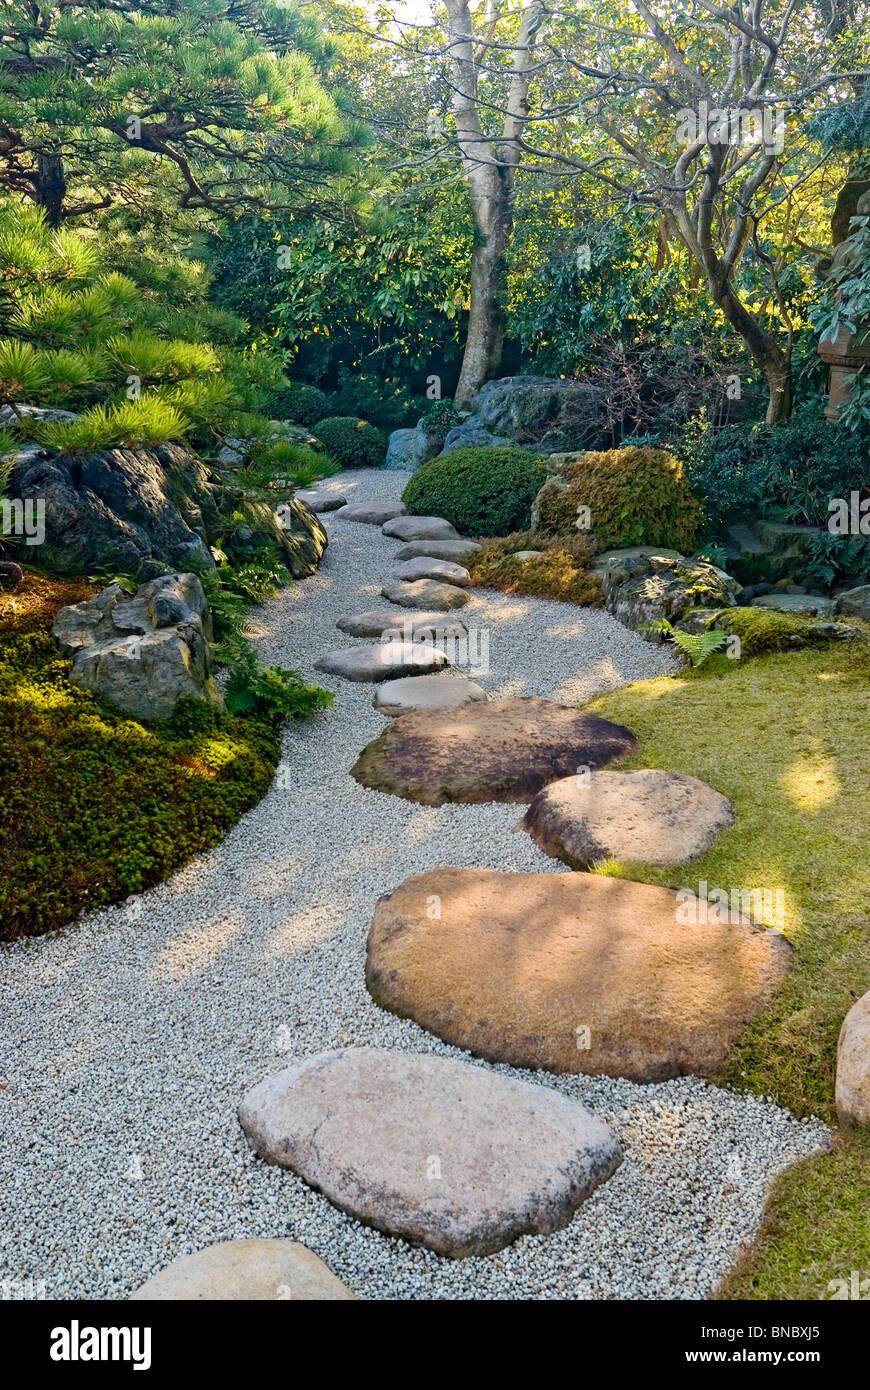 Stepping Stones Pathway Japanese Garden - Stock Image